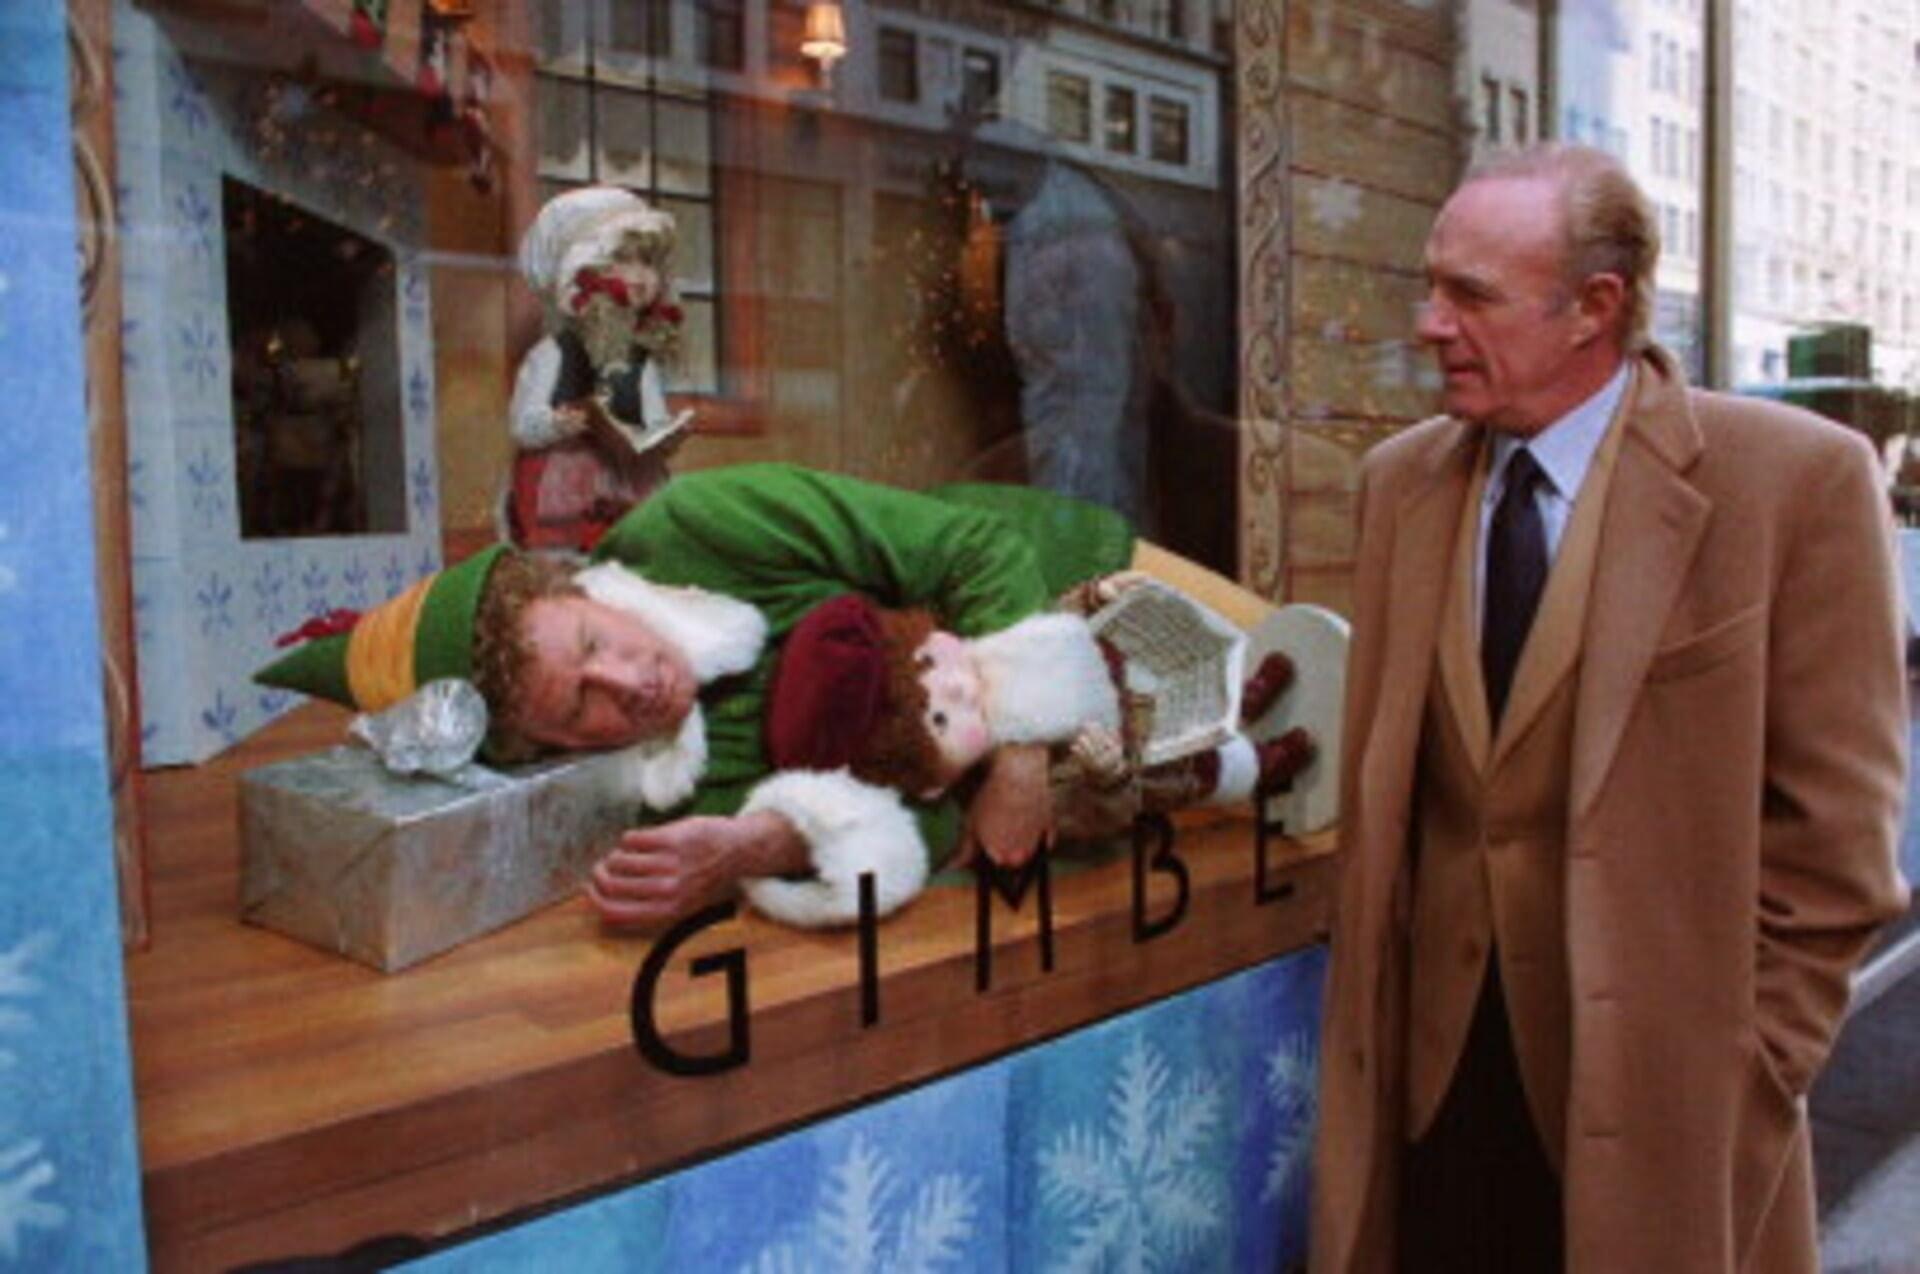 Elf - Image 7